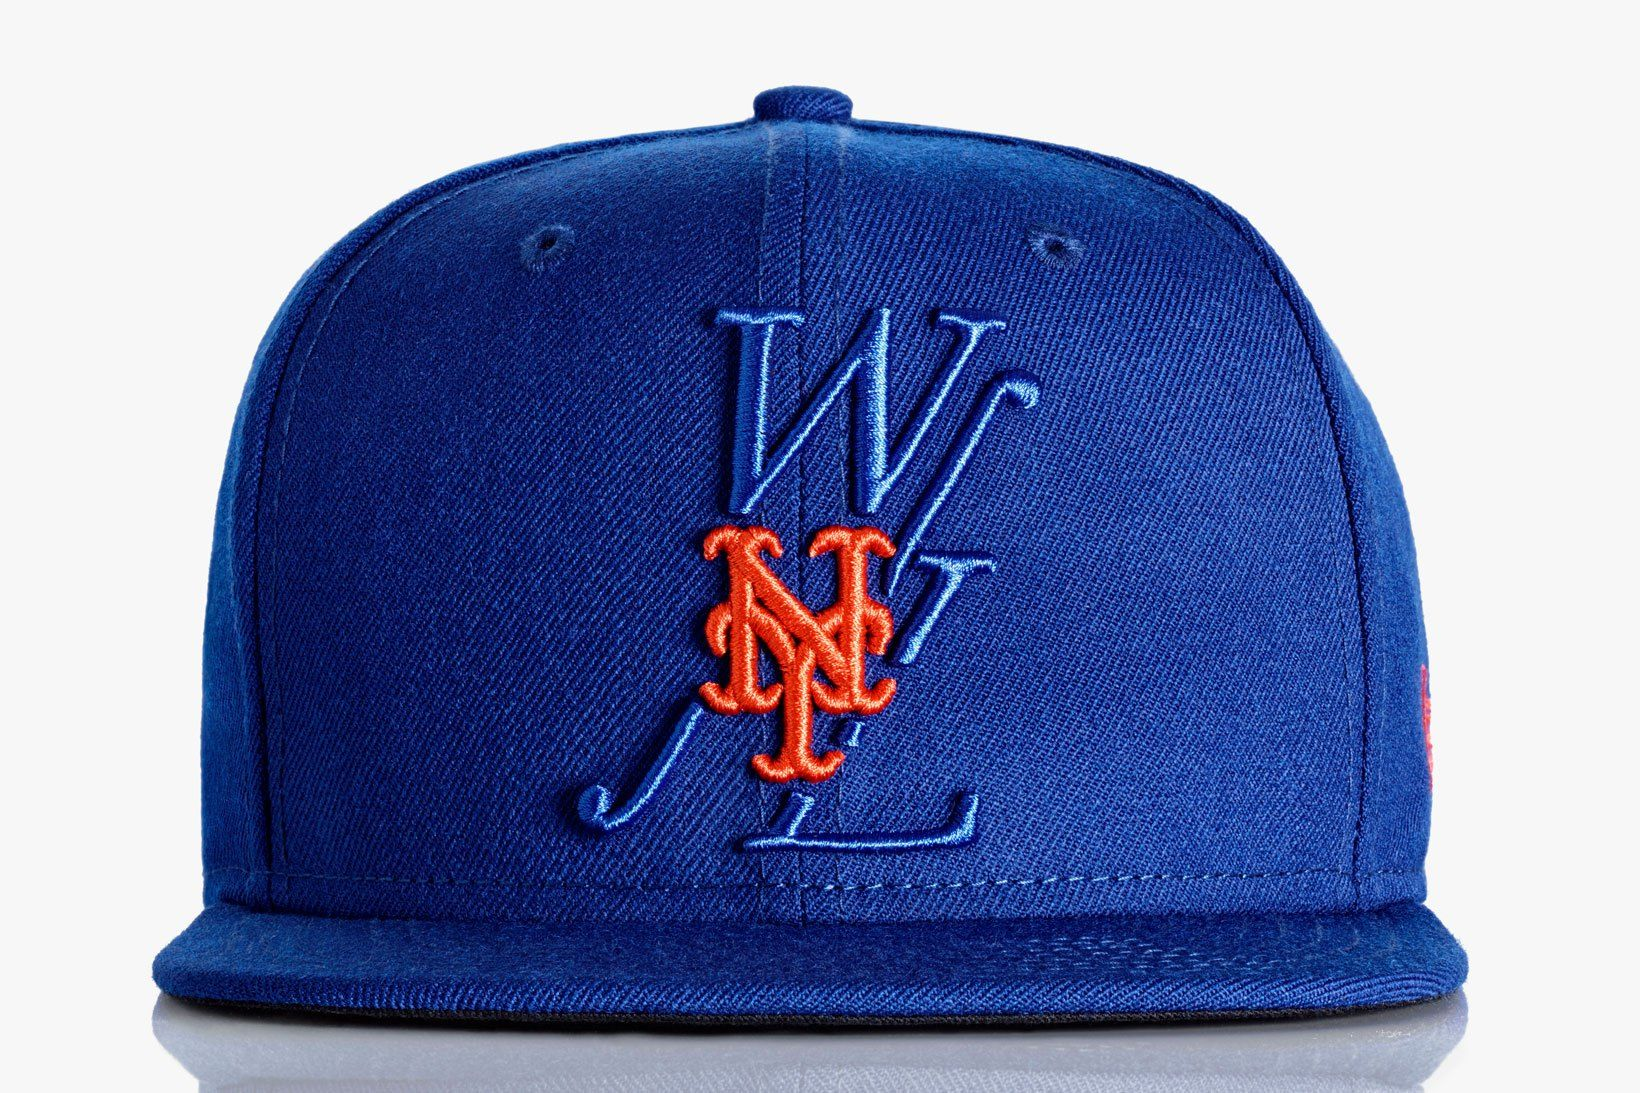 ada9b161d7 Public School x New Era Limited Edition Baseball Hats york yankees mets  fitted snapback black blue